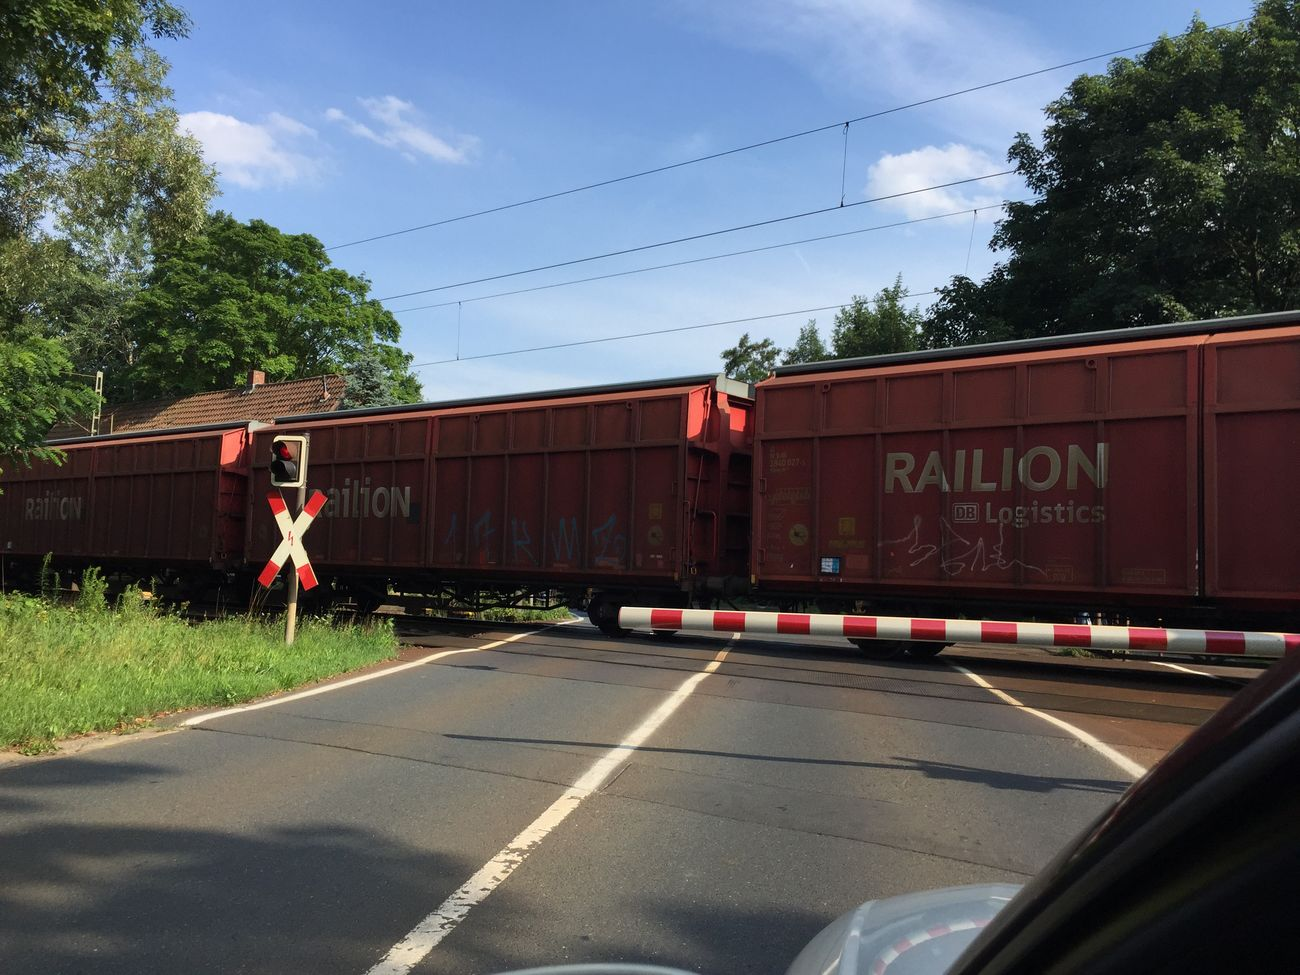 Train Wating! Life